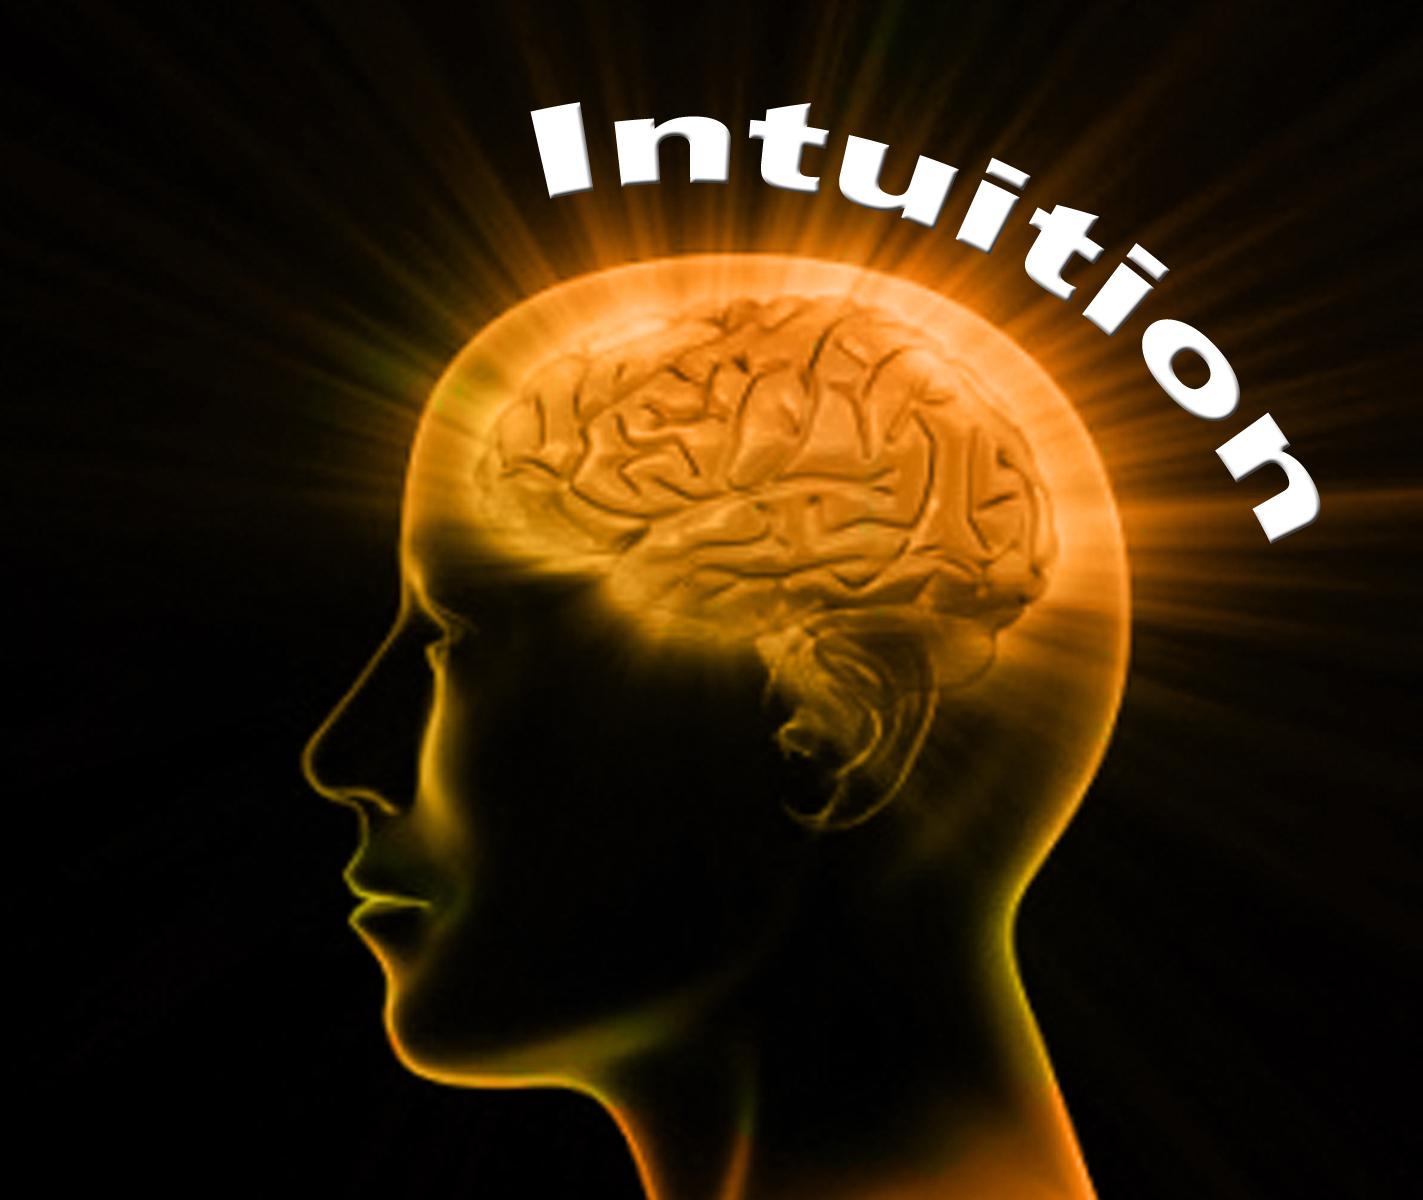 Интуиция — википедия переиздание // wiki 2